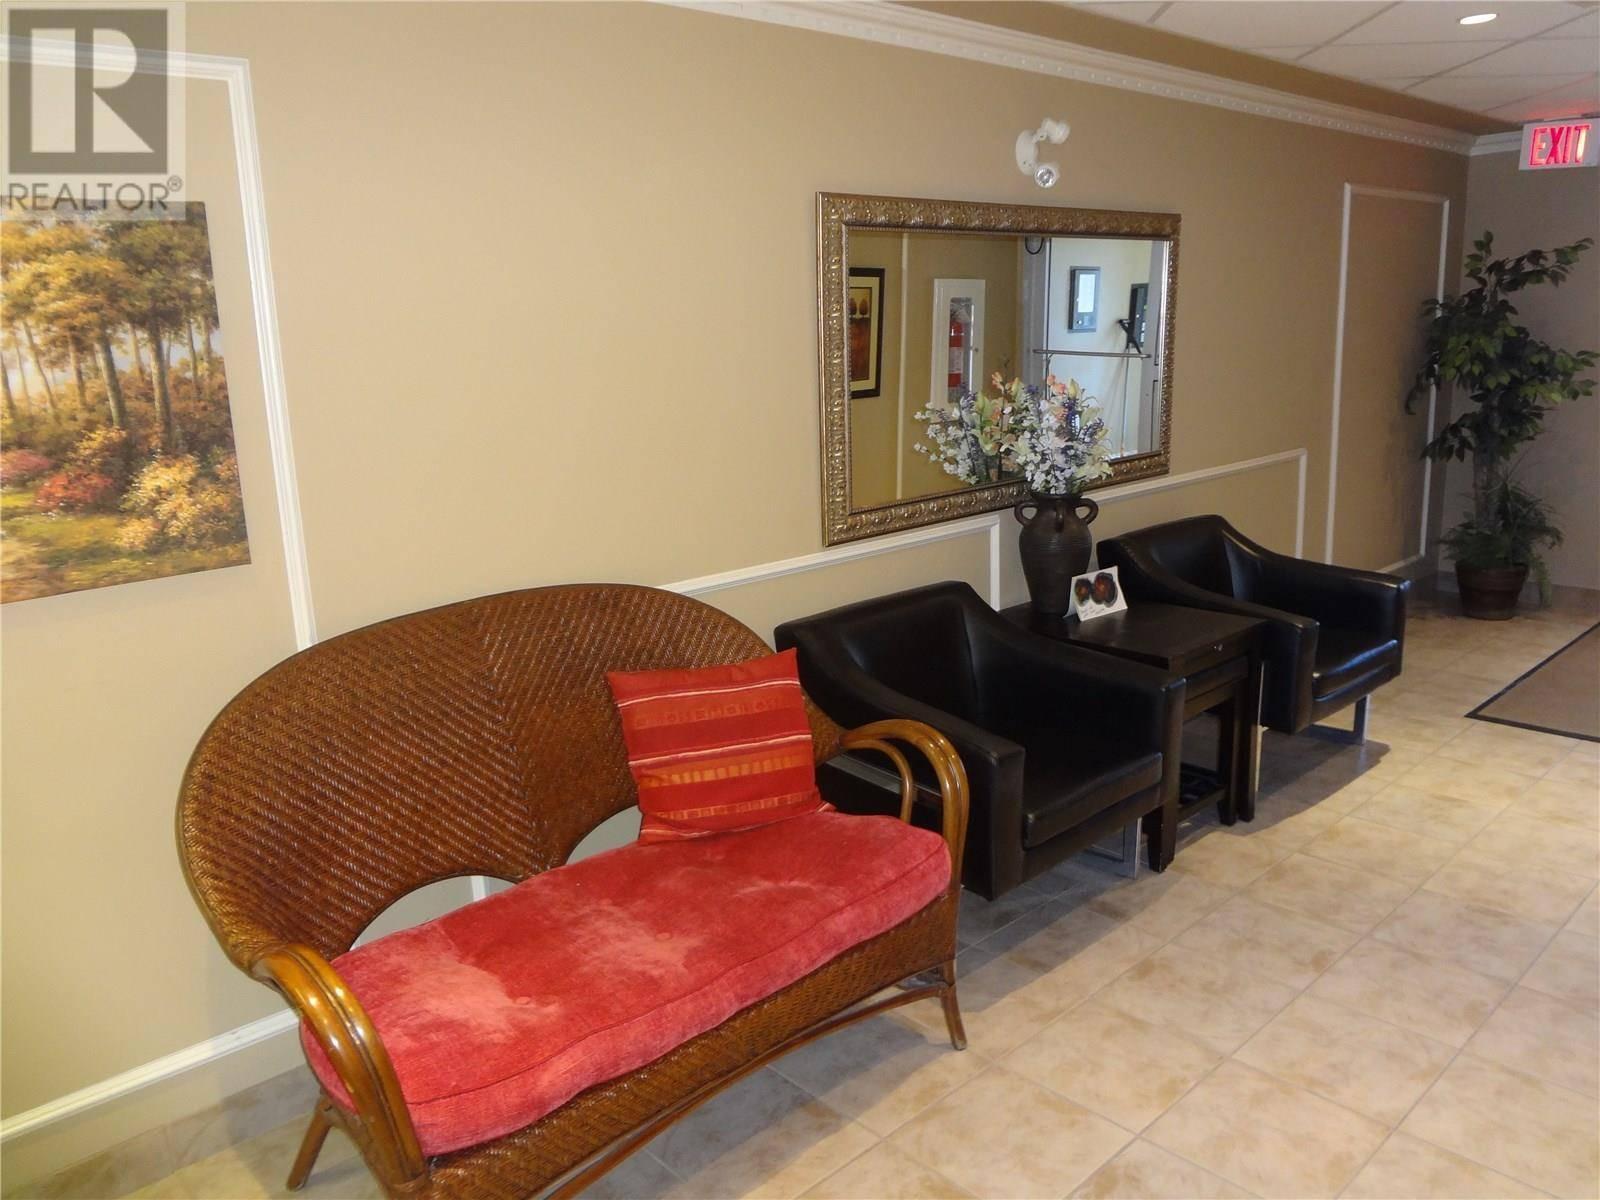 Condo for sale at 215 Lowe Rd Unit 201 Saskatoon Saskatchewan - MLS: SK786409